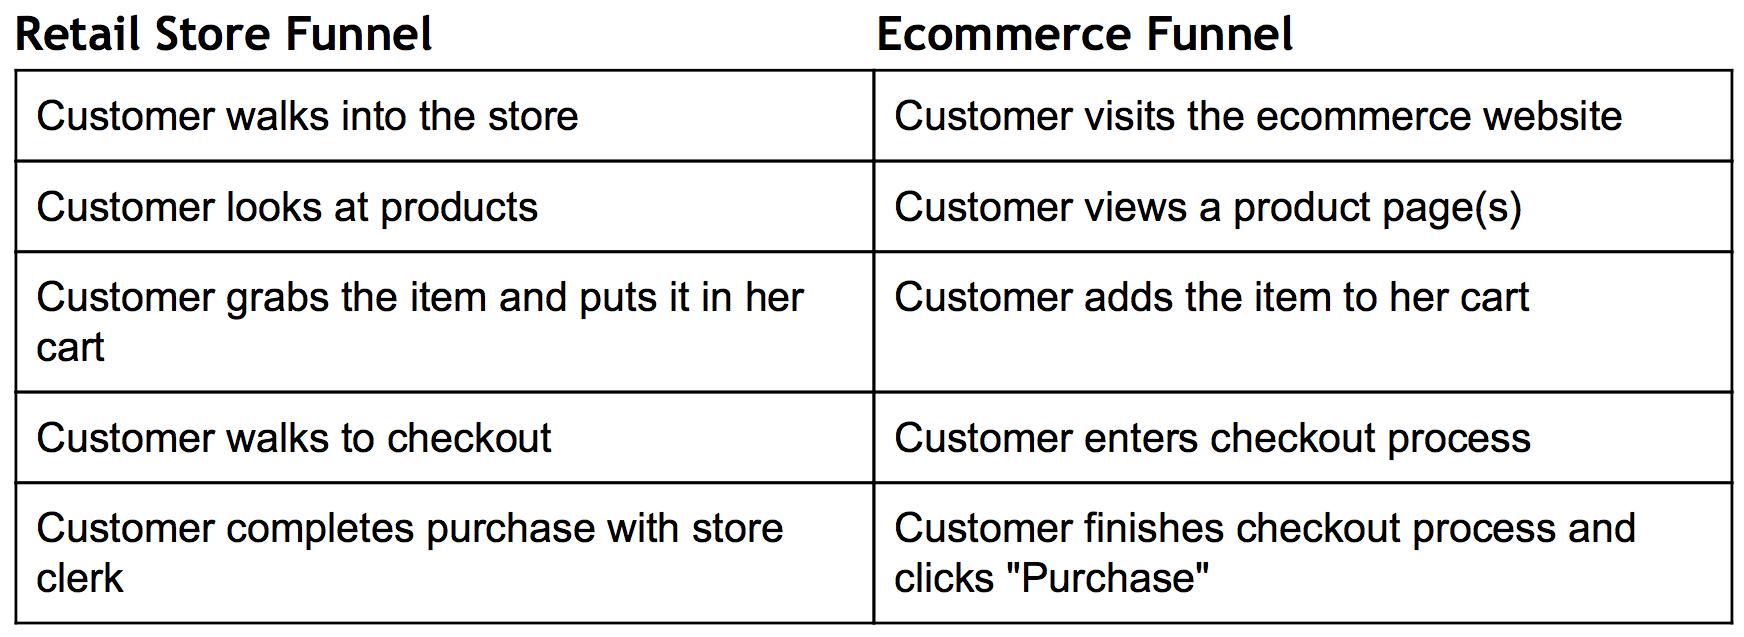 marketing funnel comparison-retail-store-ecommerce